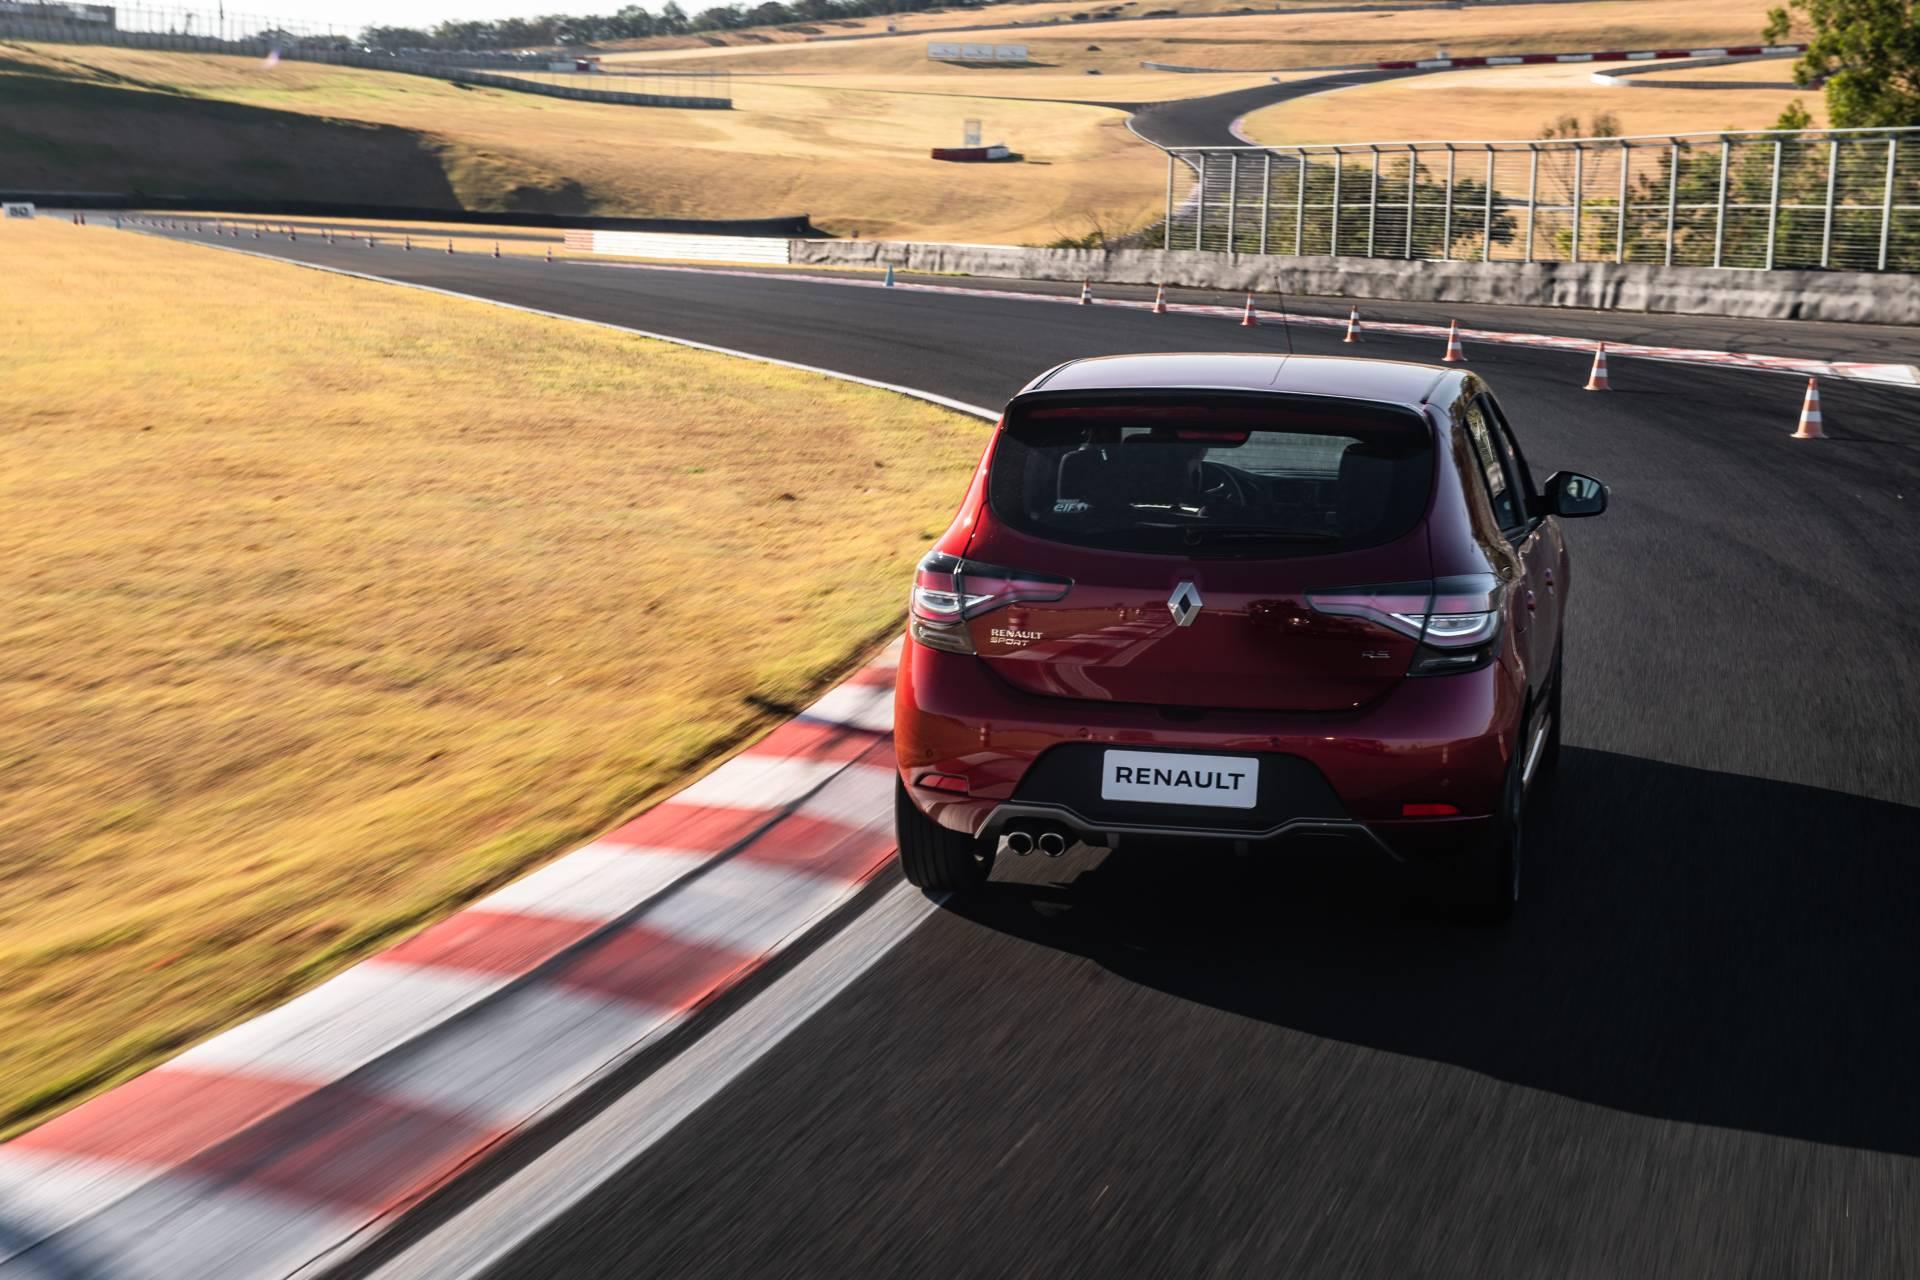 2020_Renault_Sandero_RS_facelift_0019